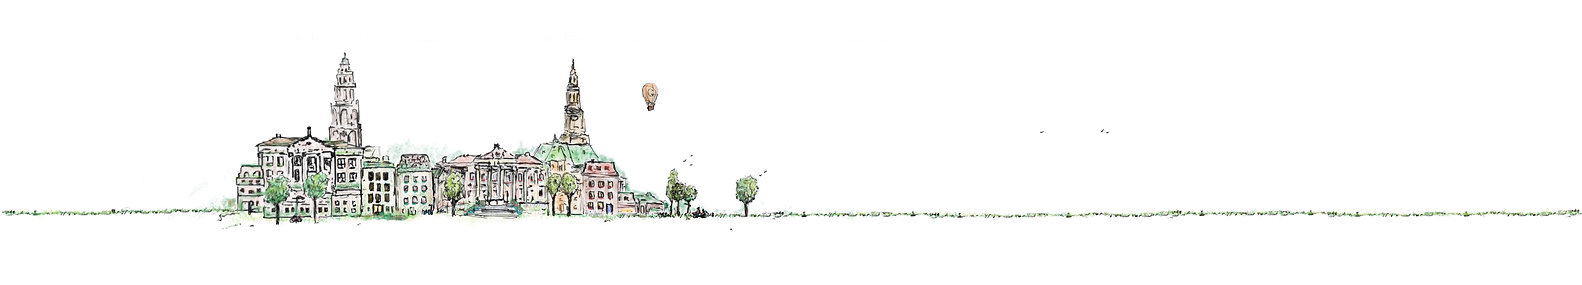 Untitled 9.jpg